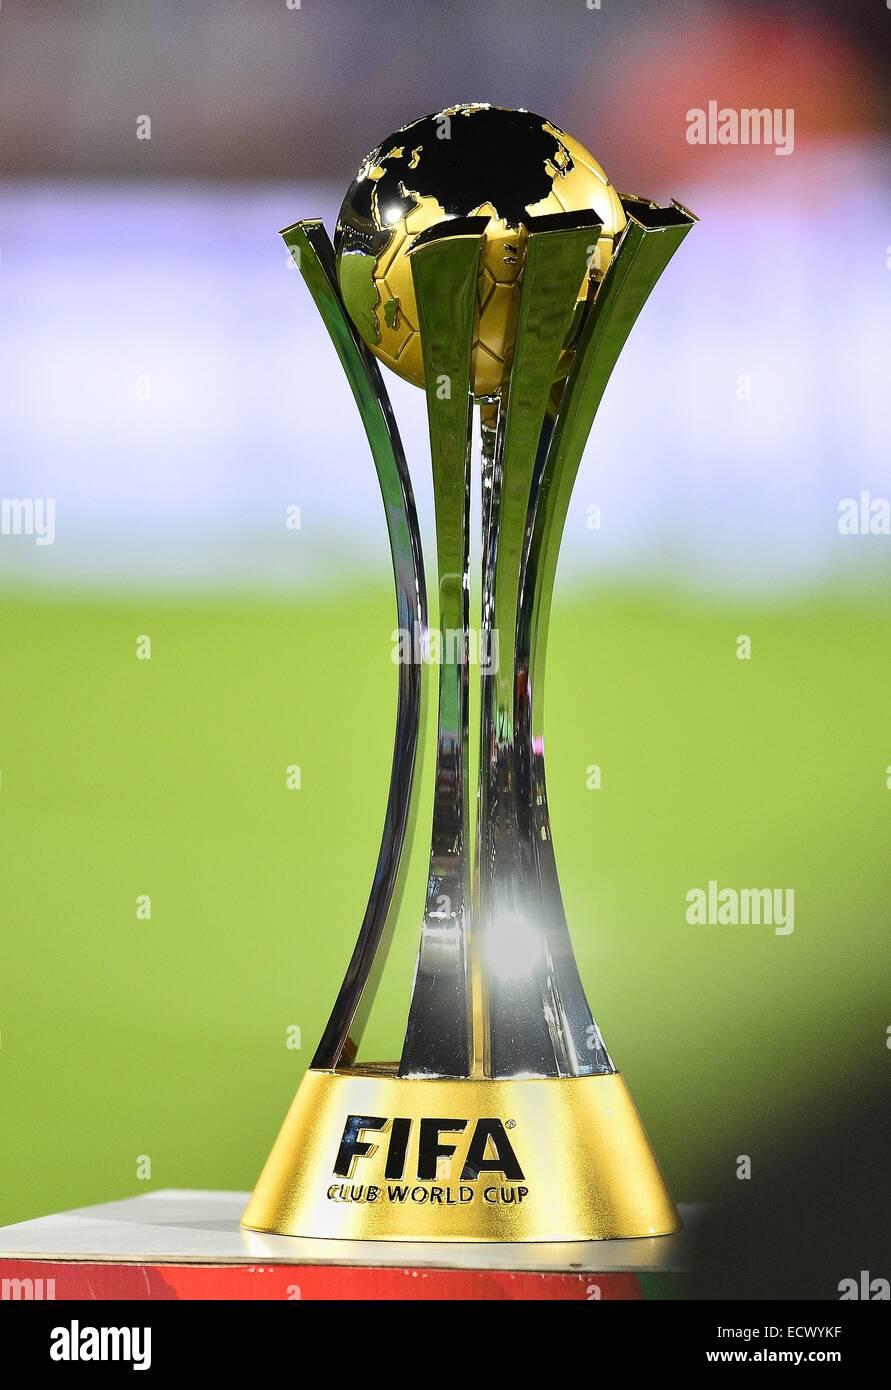 FIFA Club World Cup TrophyDesigner Thomas Fattorini Ltd Birmingham UK Jane Powell Lead Dawn Forbes Manufacturer